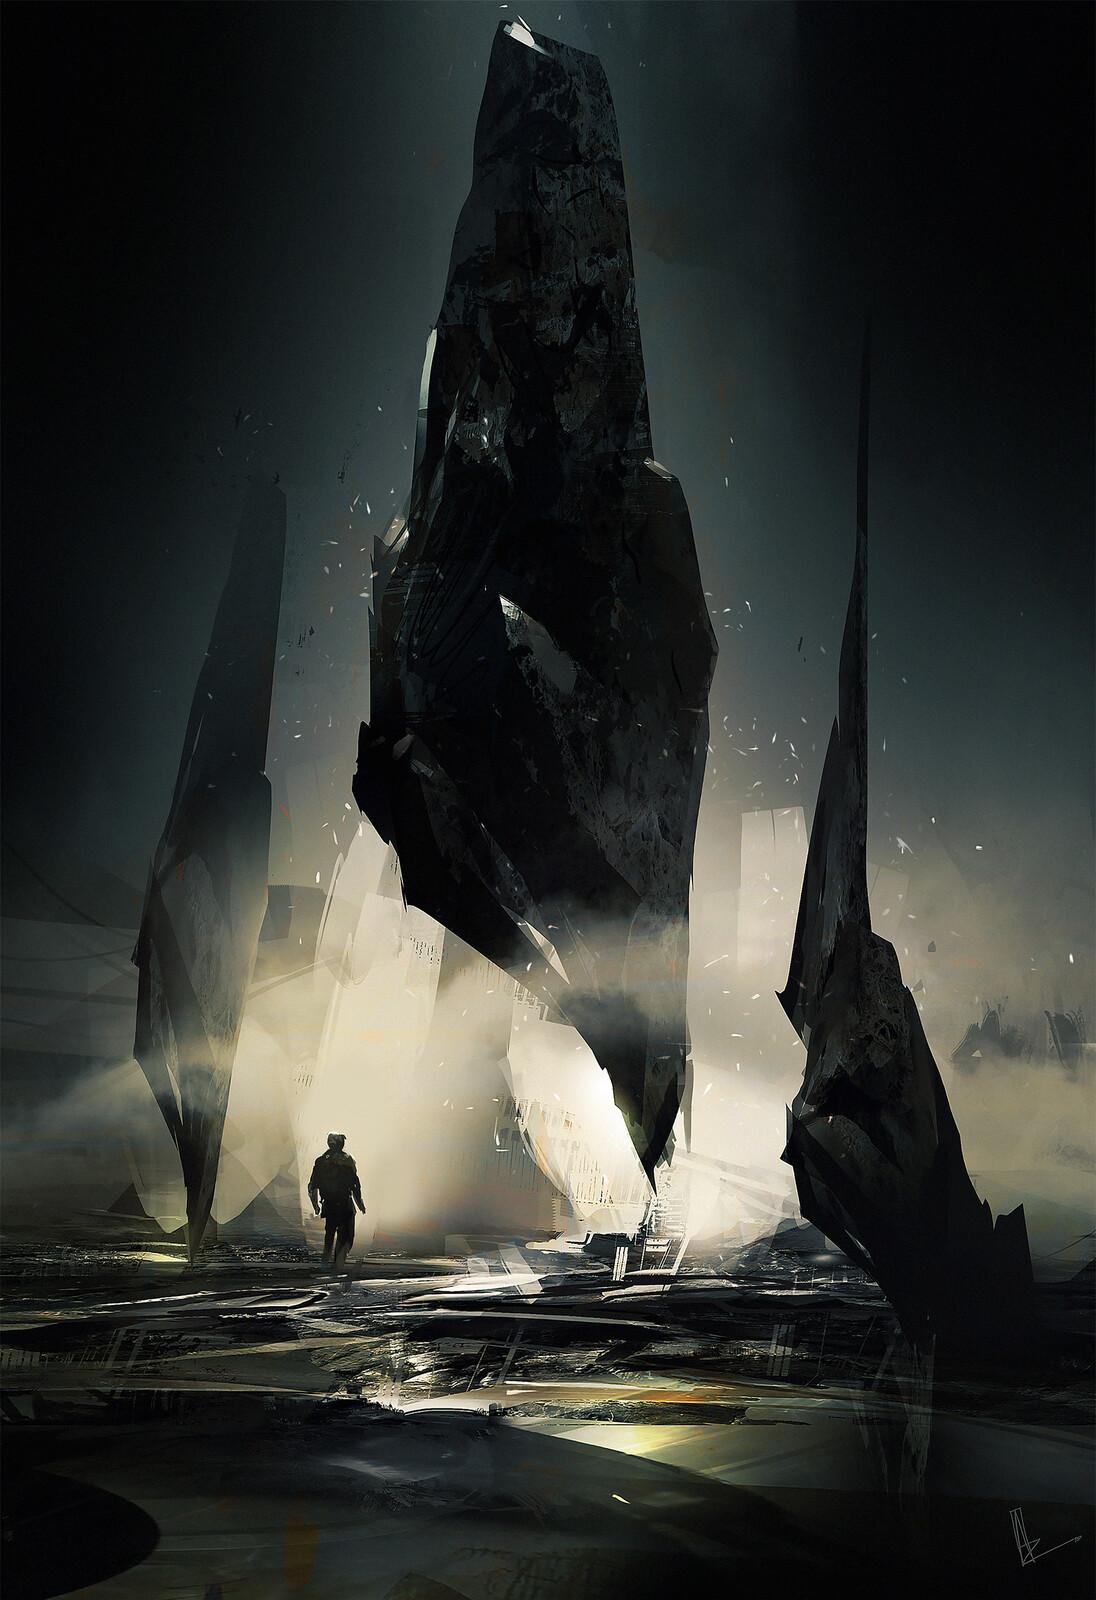 The Strange Rock